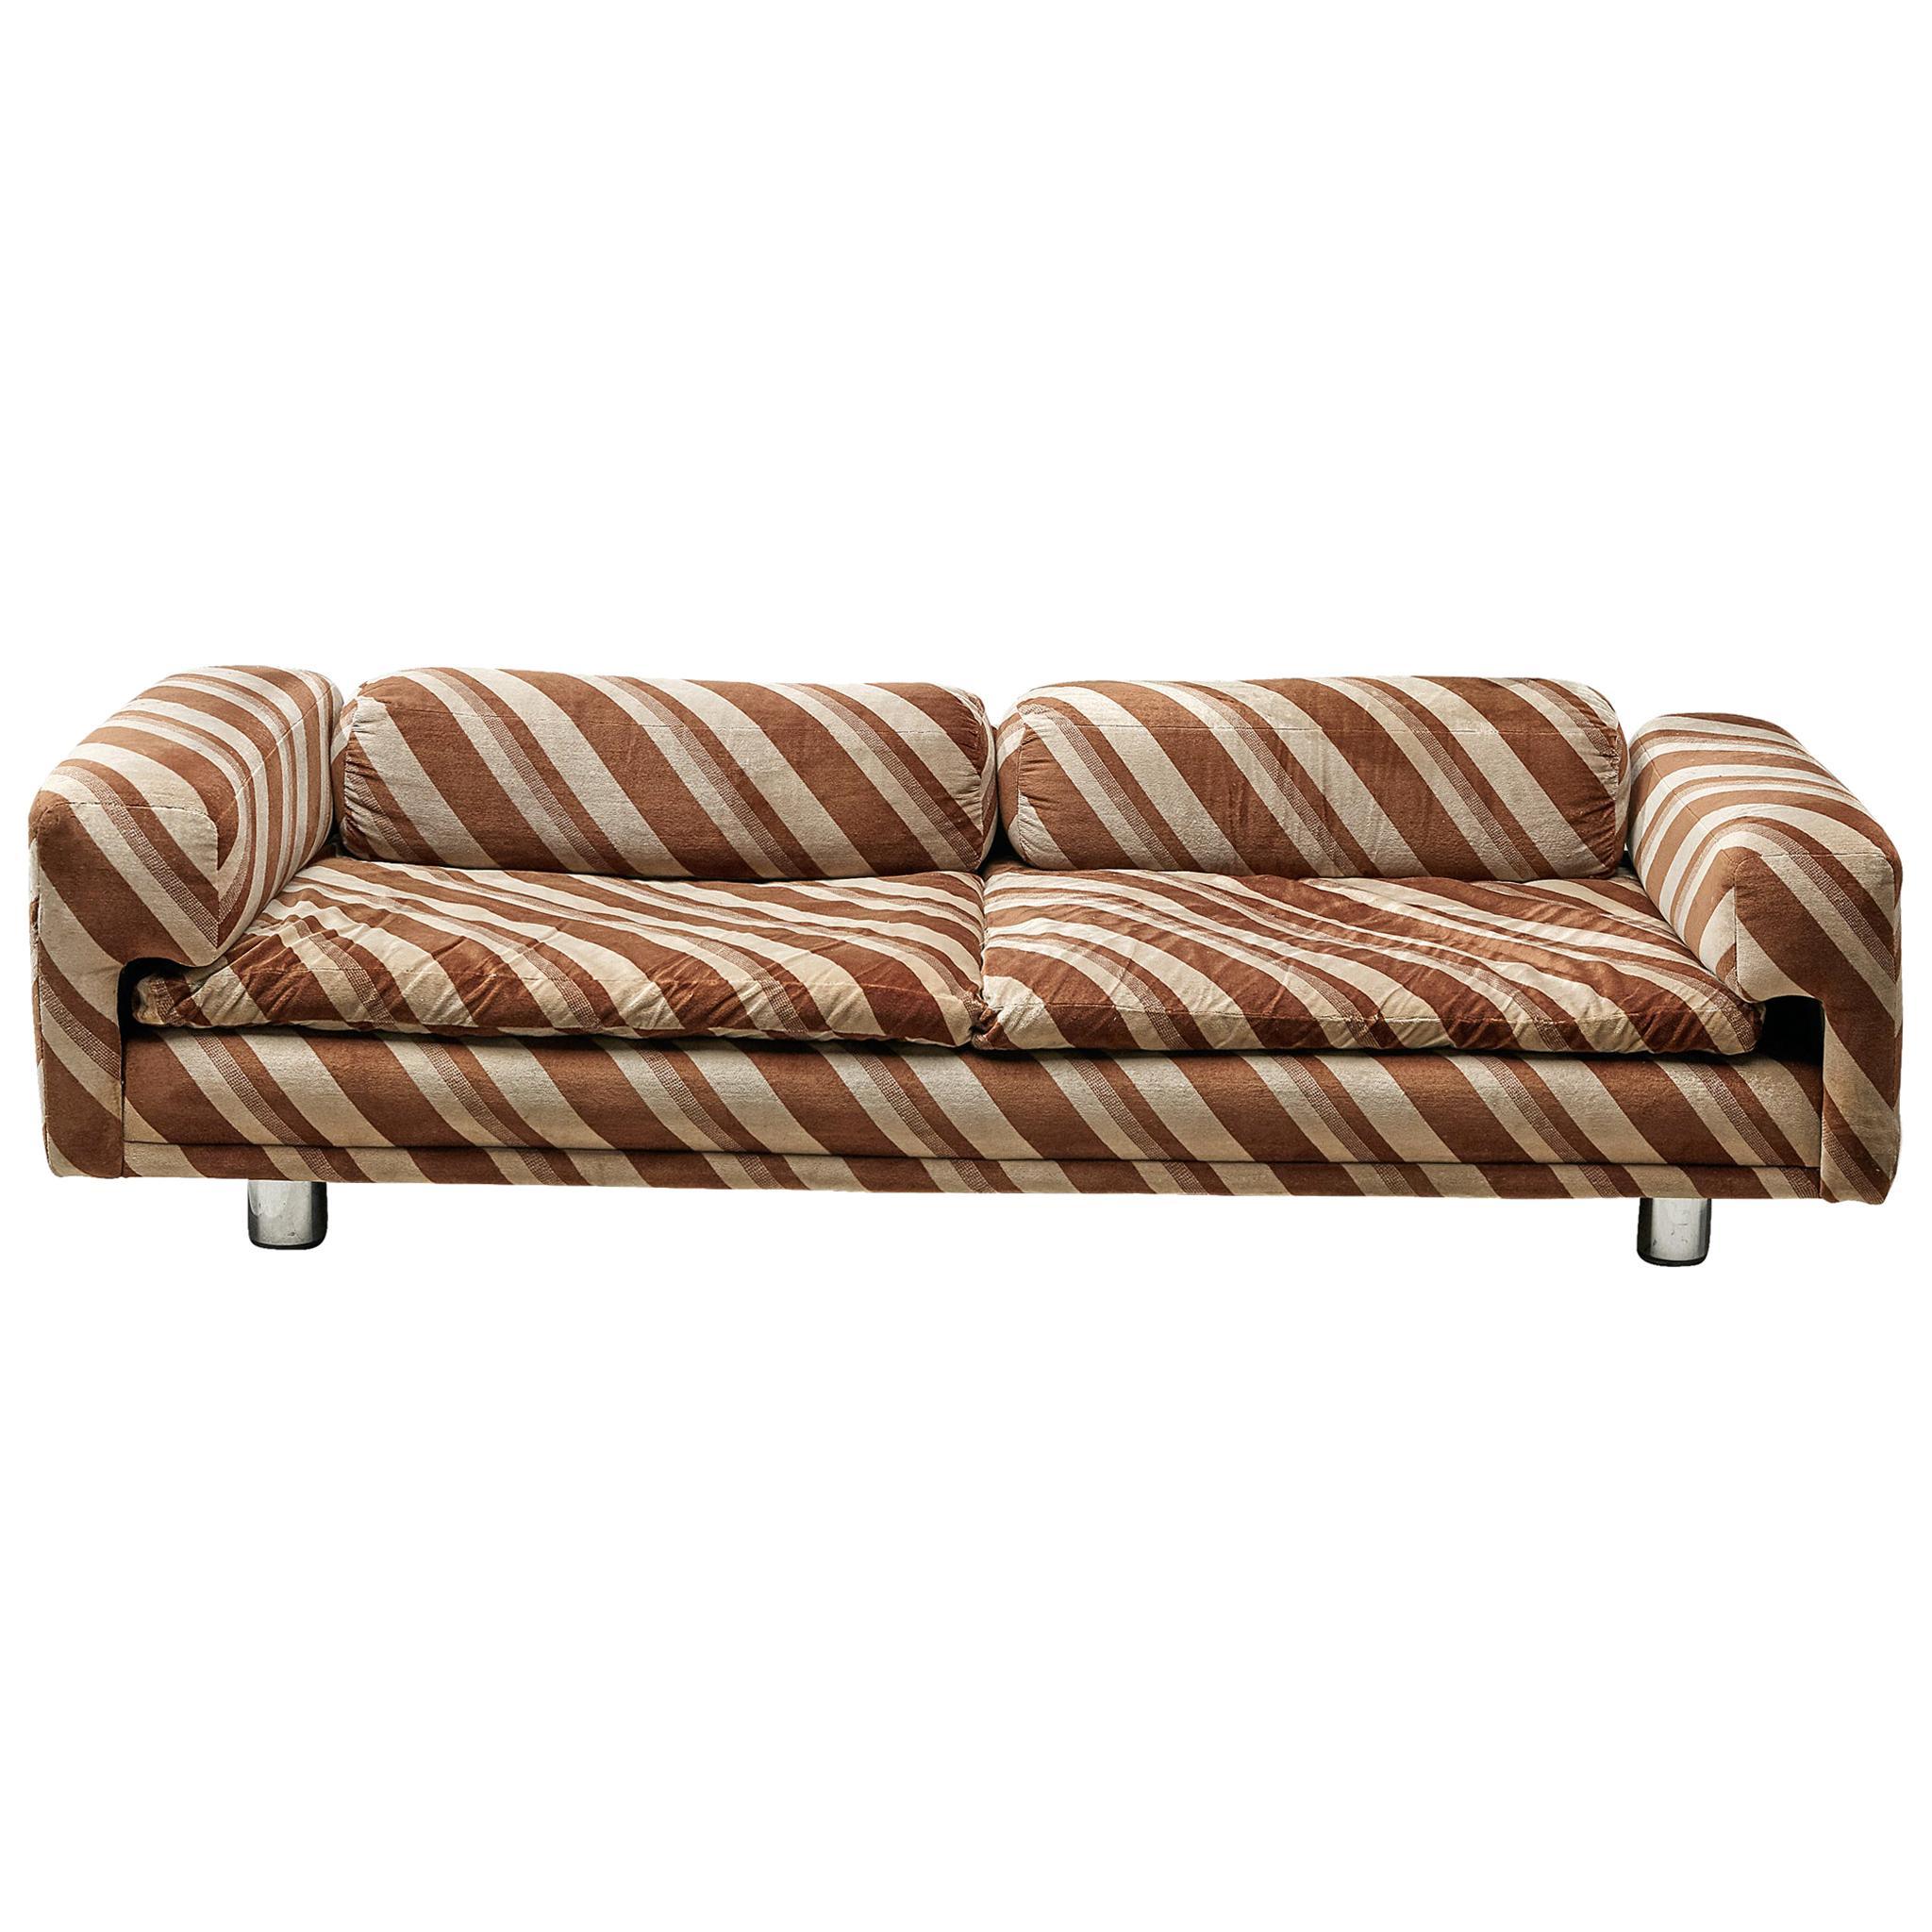 Howard Keith 'Grand 'Diplomat' Sofa